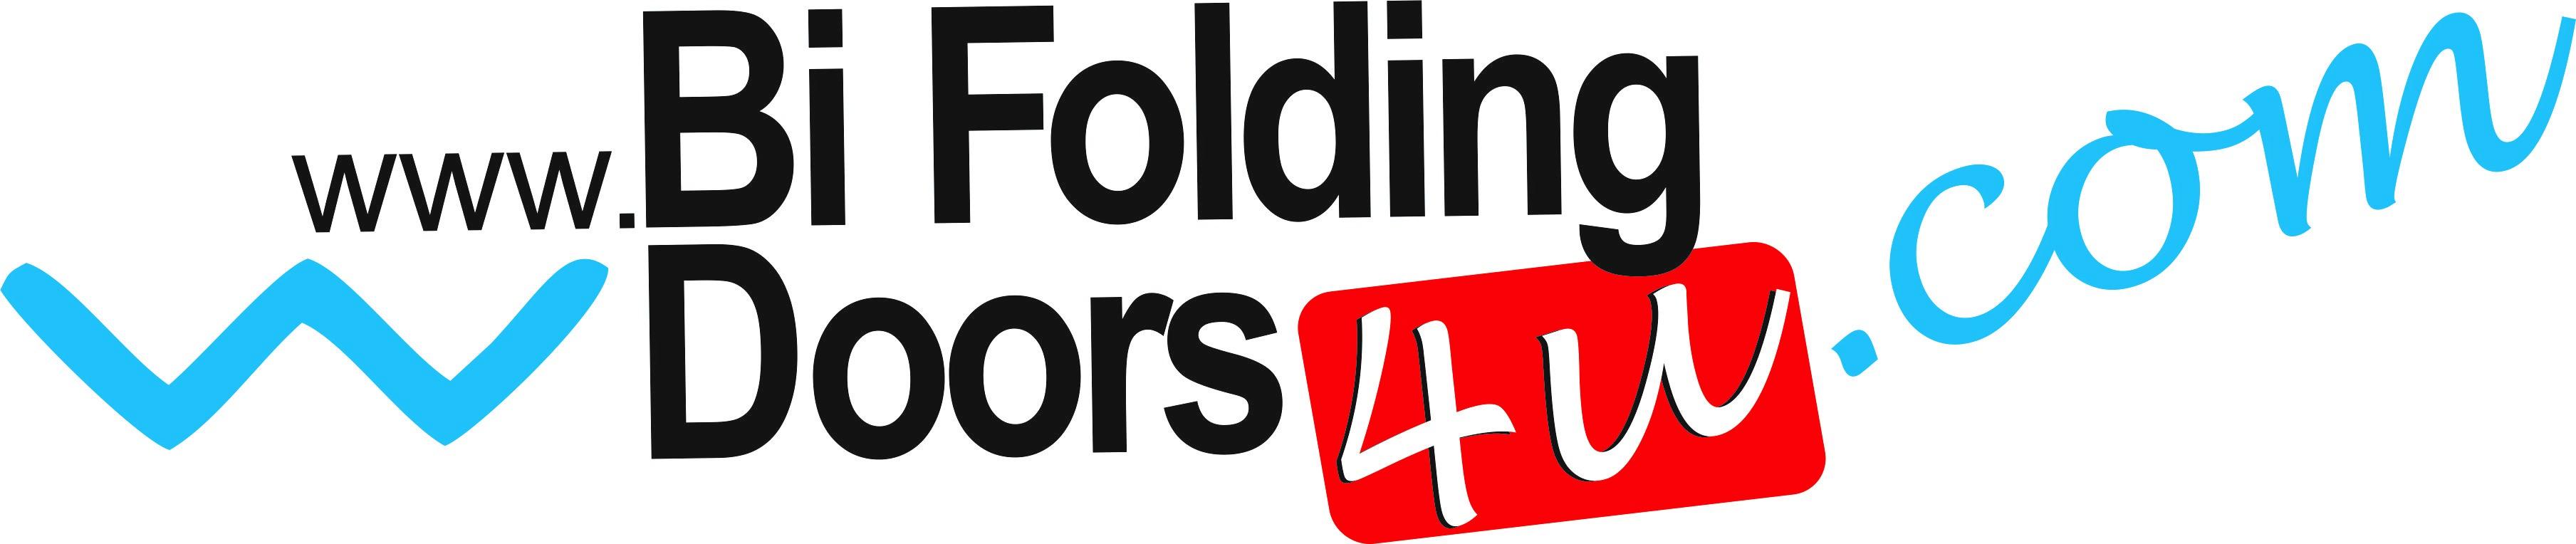 Bi Folding Doors-4U